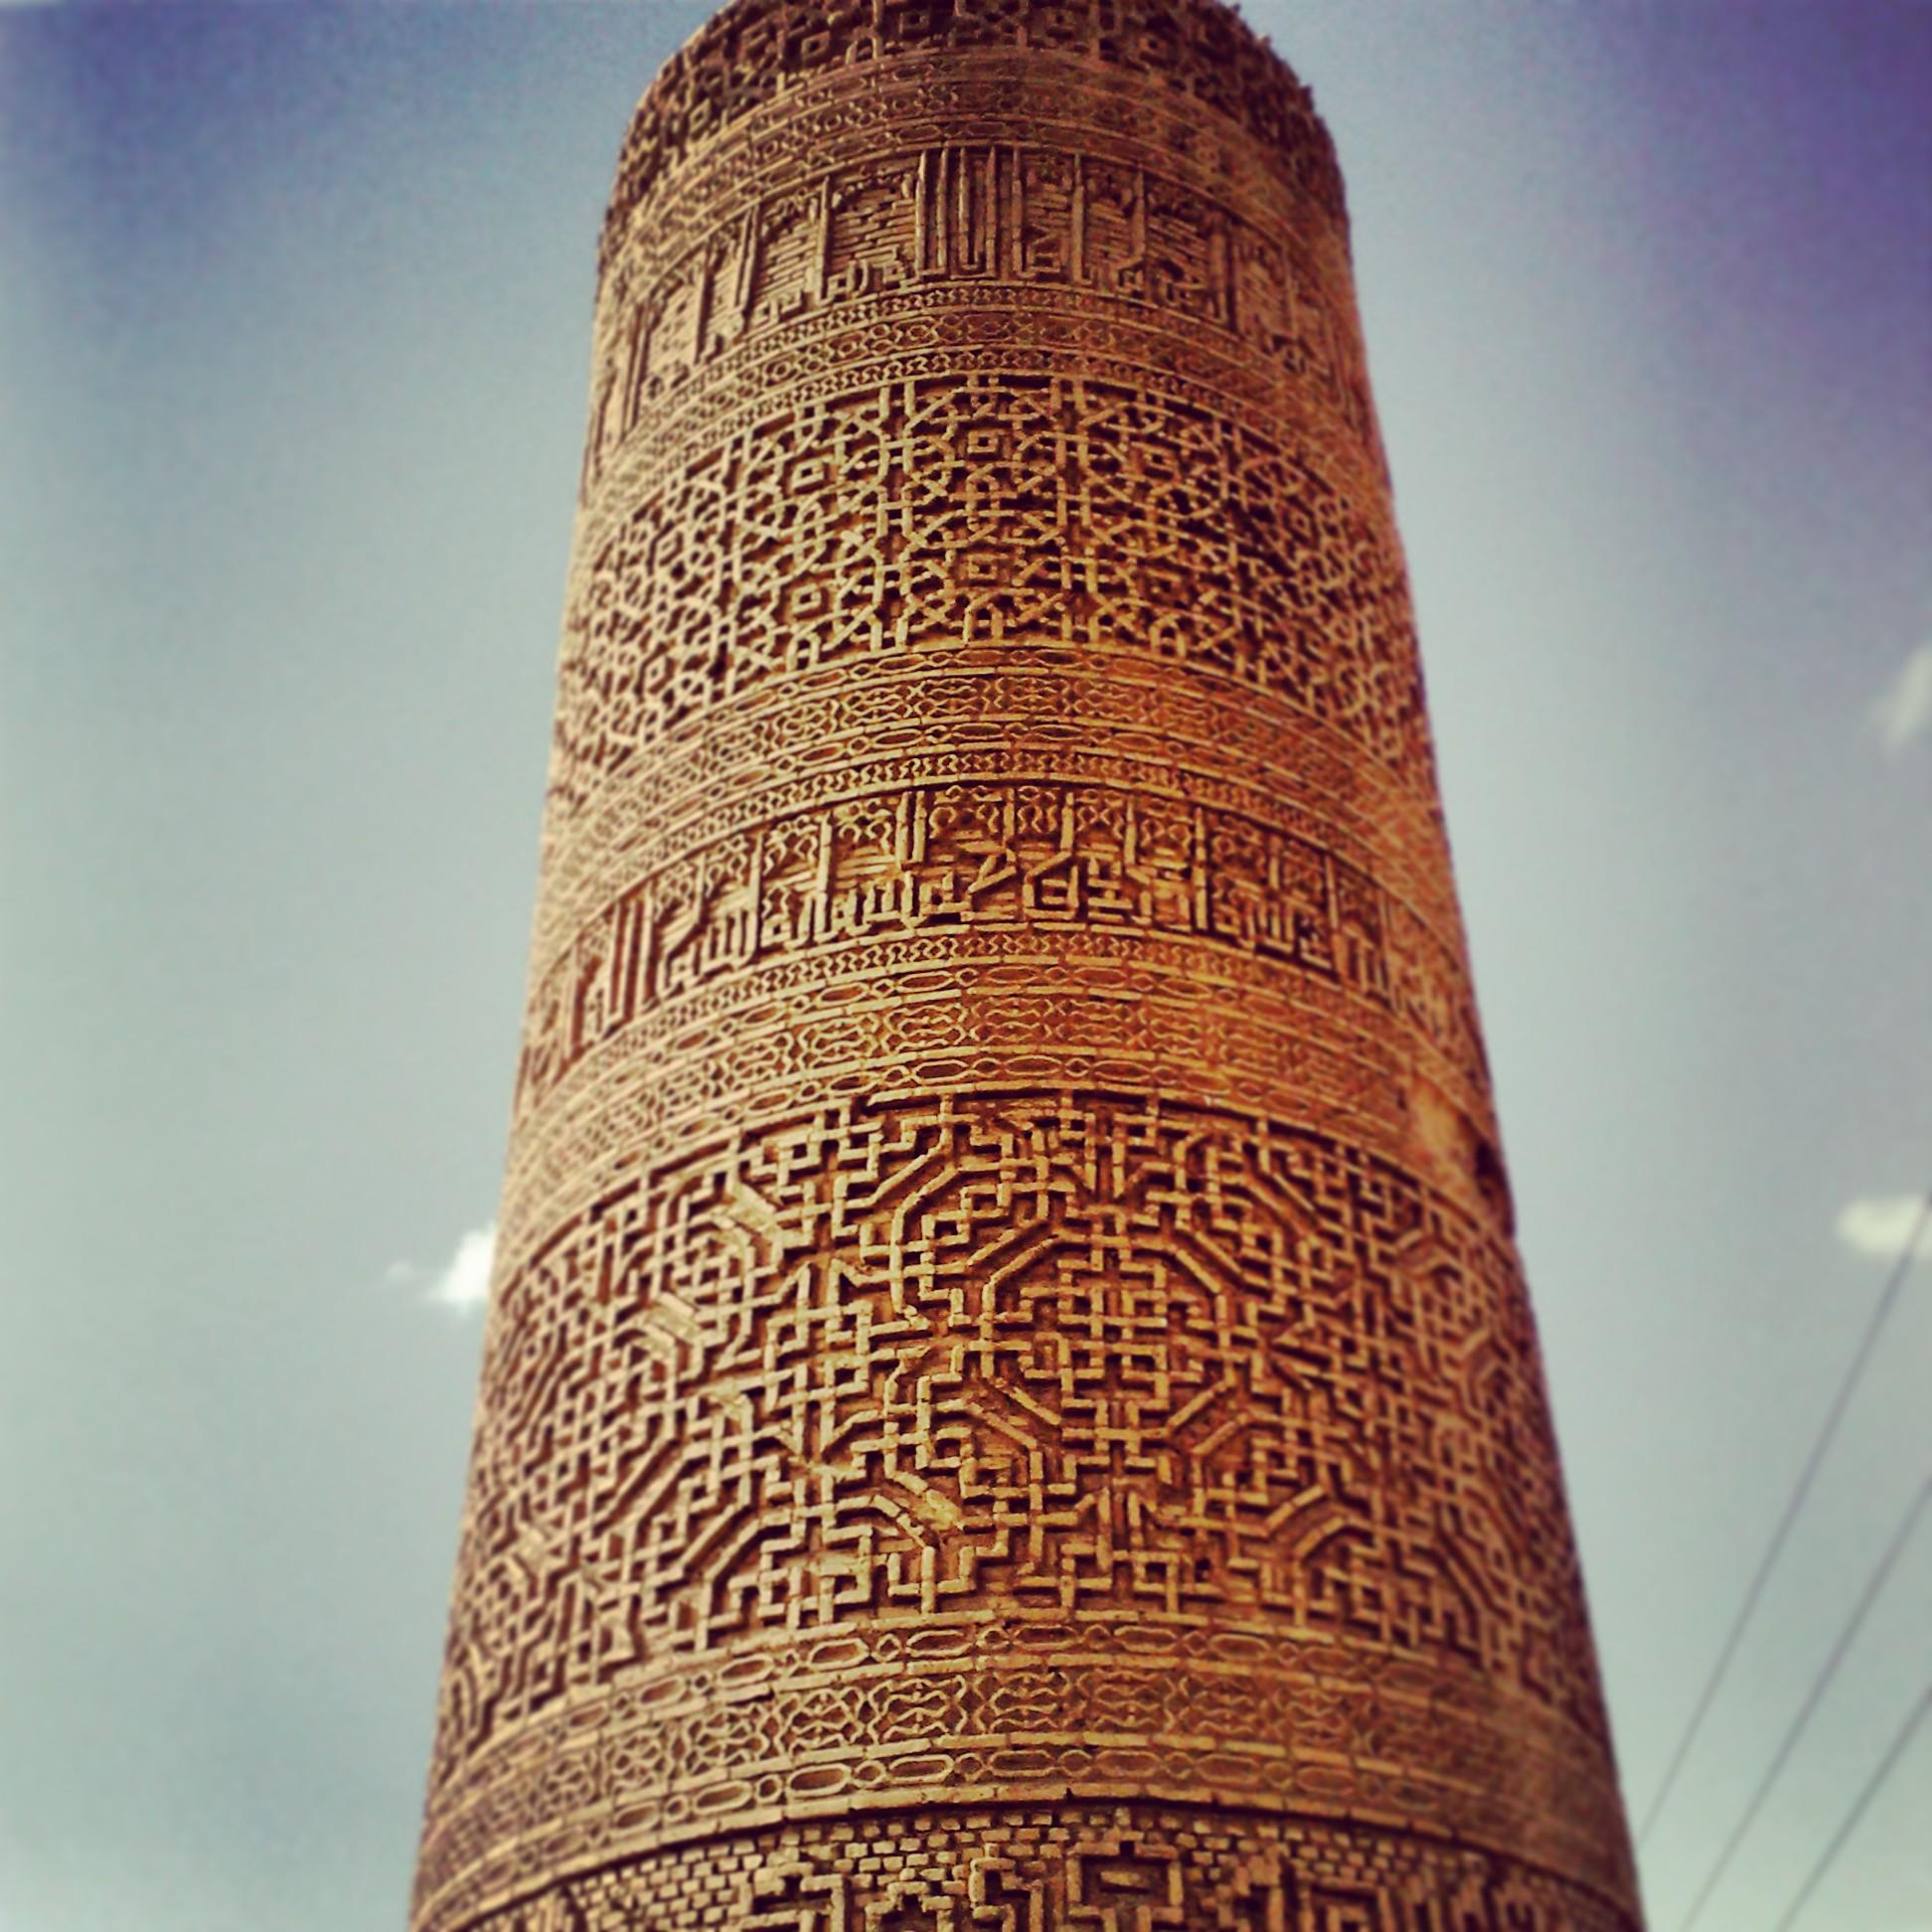 مناره مسجد جامع ساوه